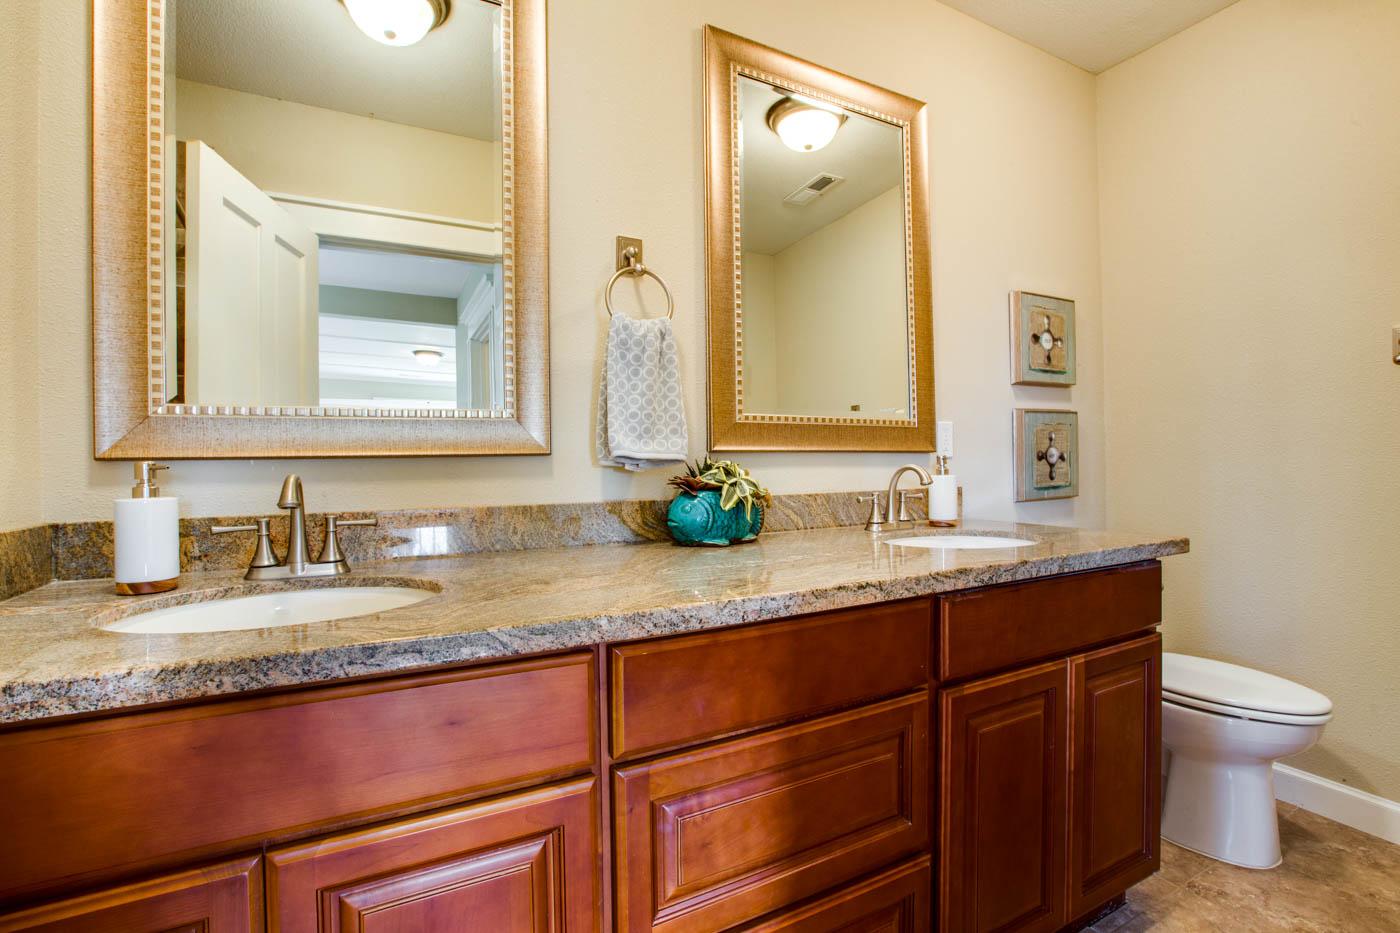 master suite bath_upper_5314 SE Milwaukie Ave_053_webres.jpg